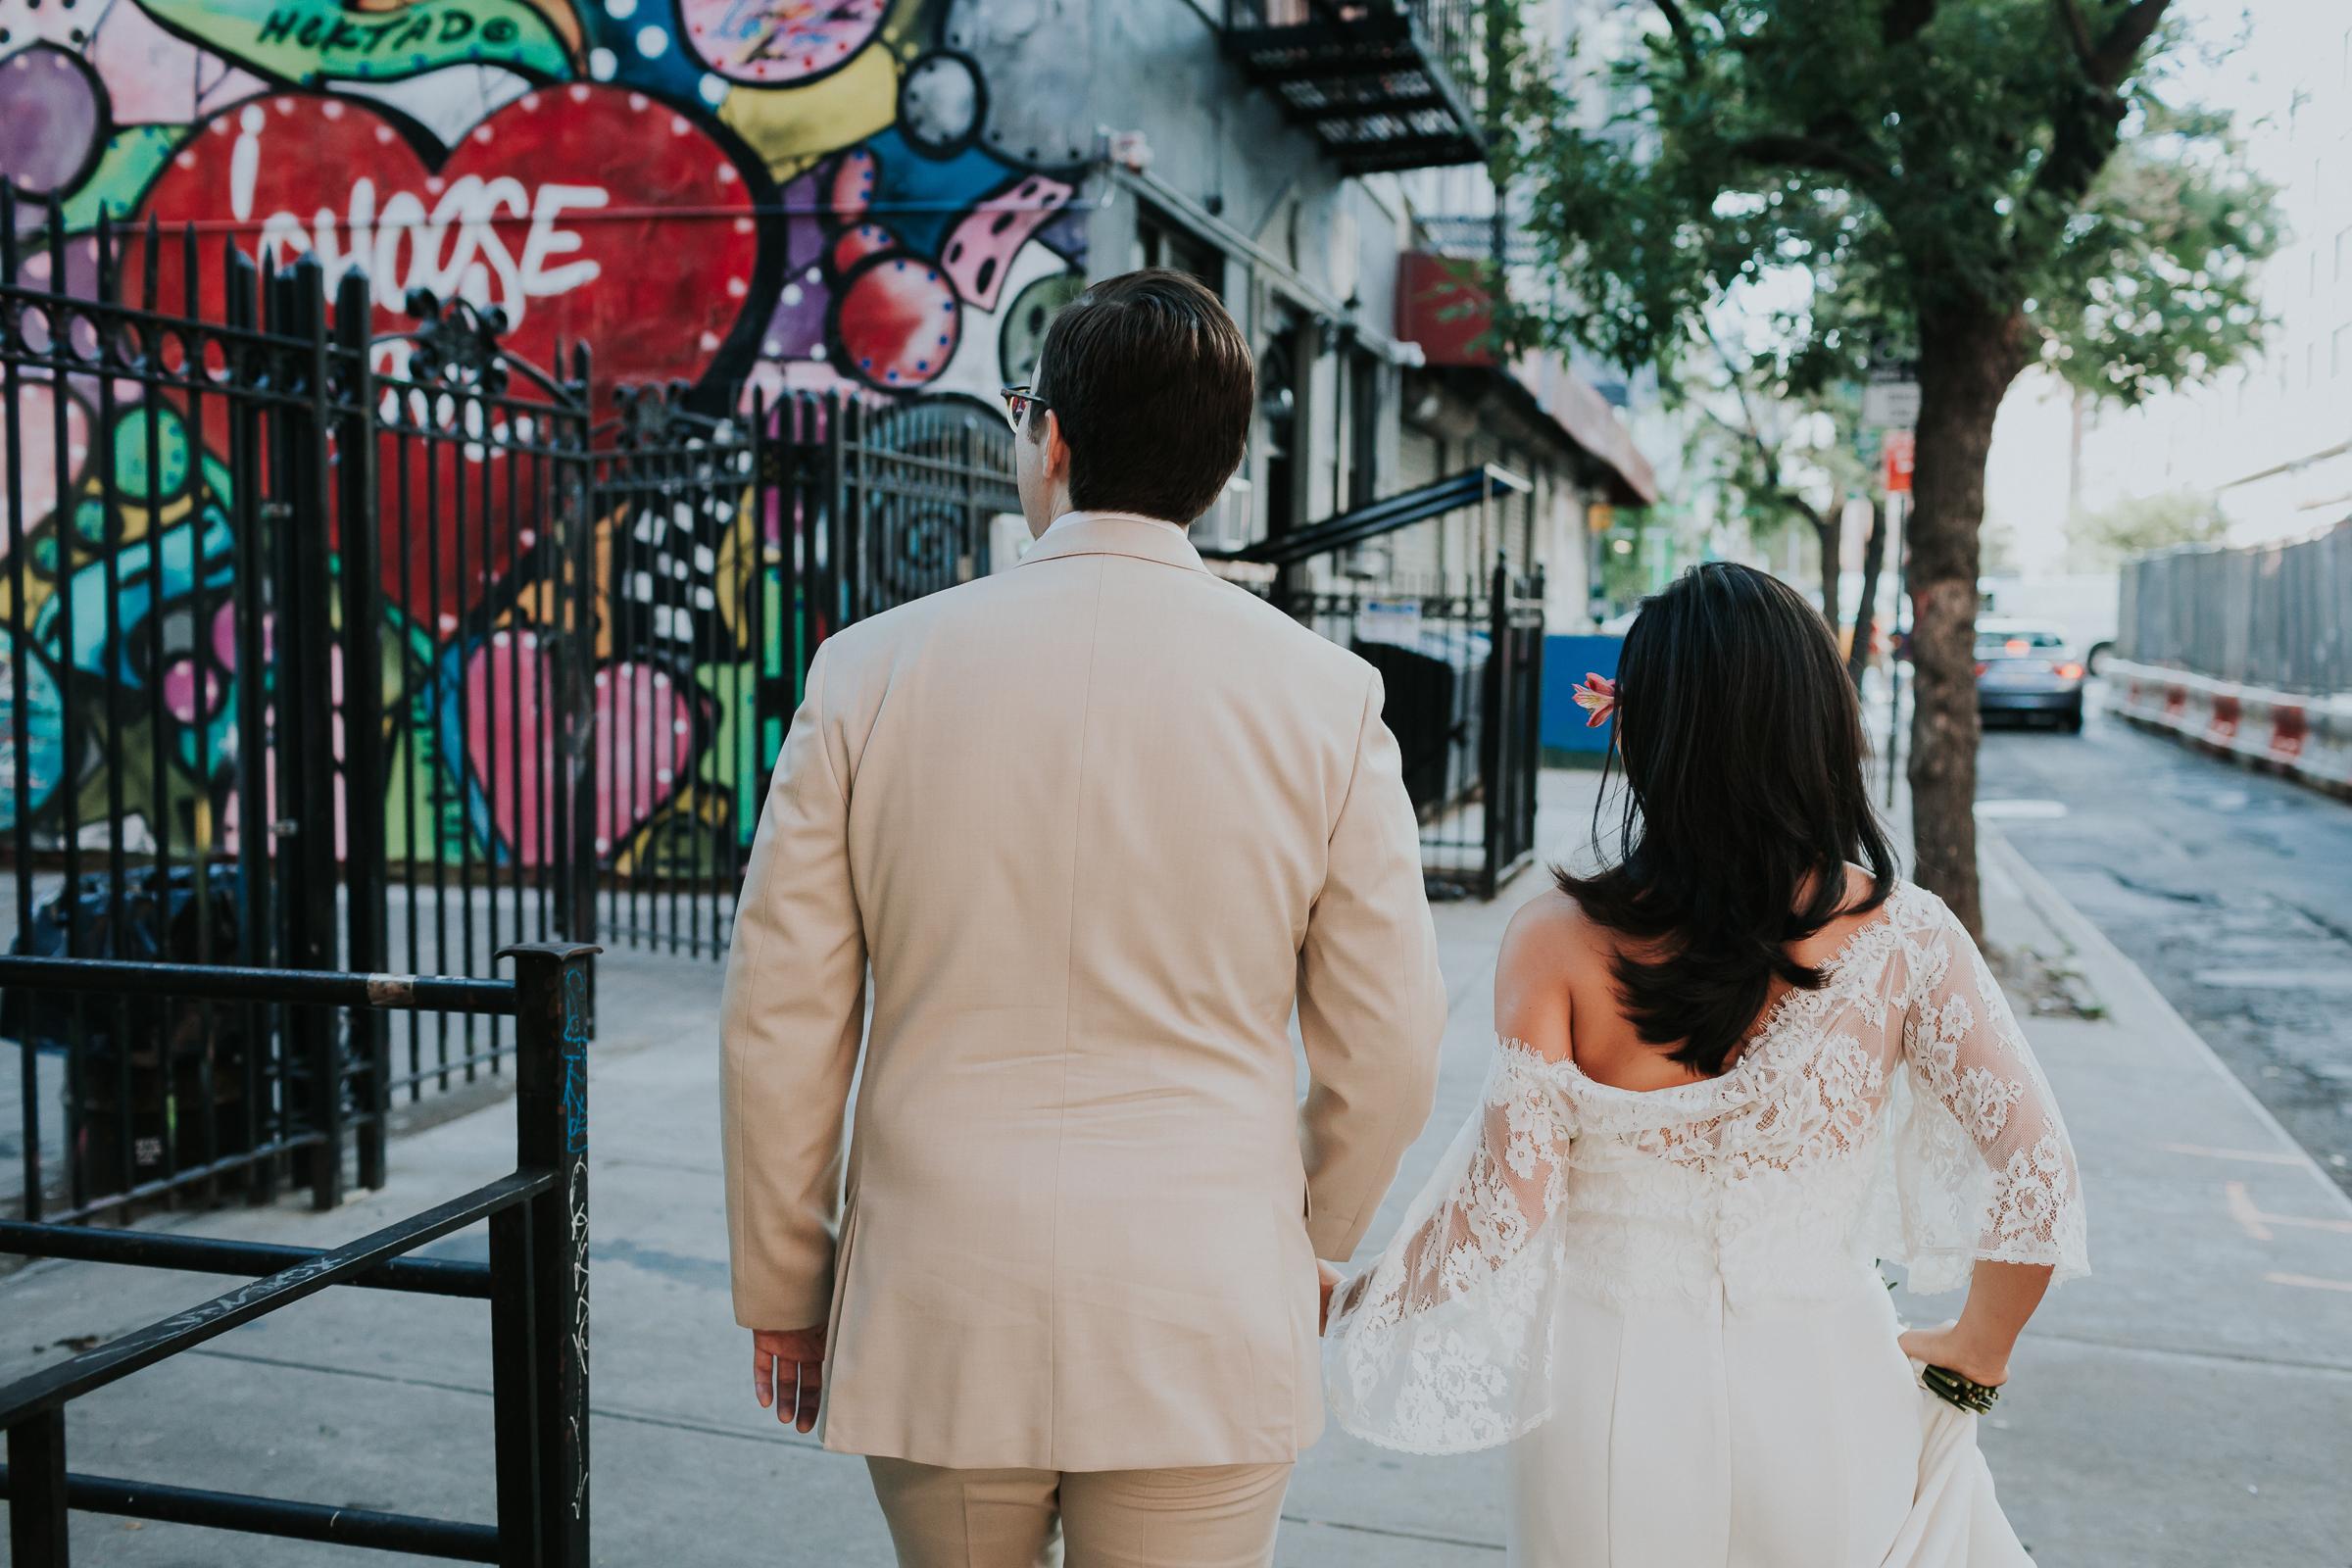 The-Bhakti-Center-Yoga-NYC-Rooftop-Documentary-Wedding-Photographer-5.jpg